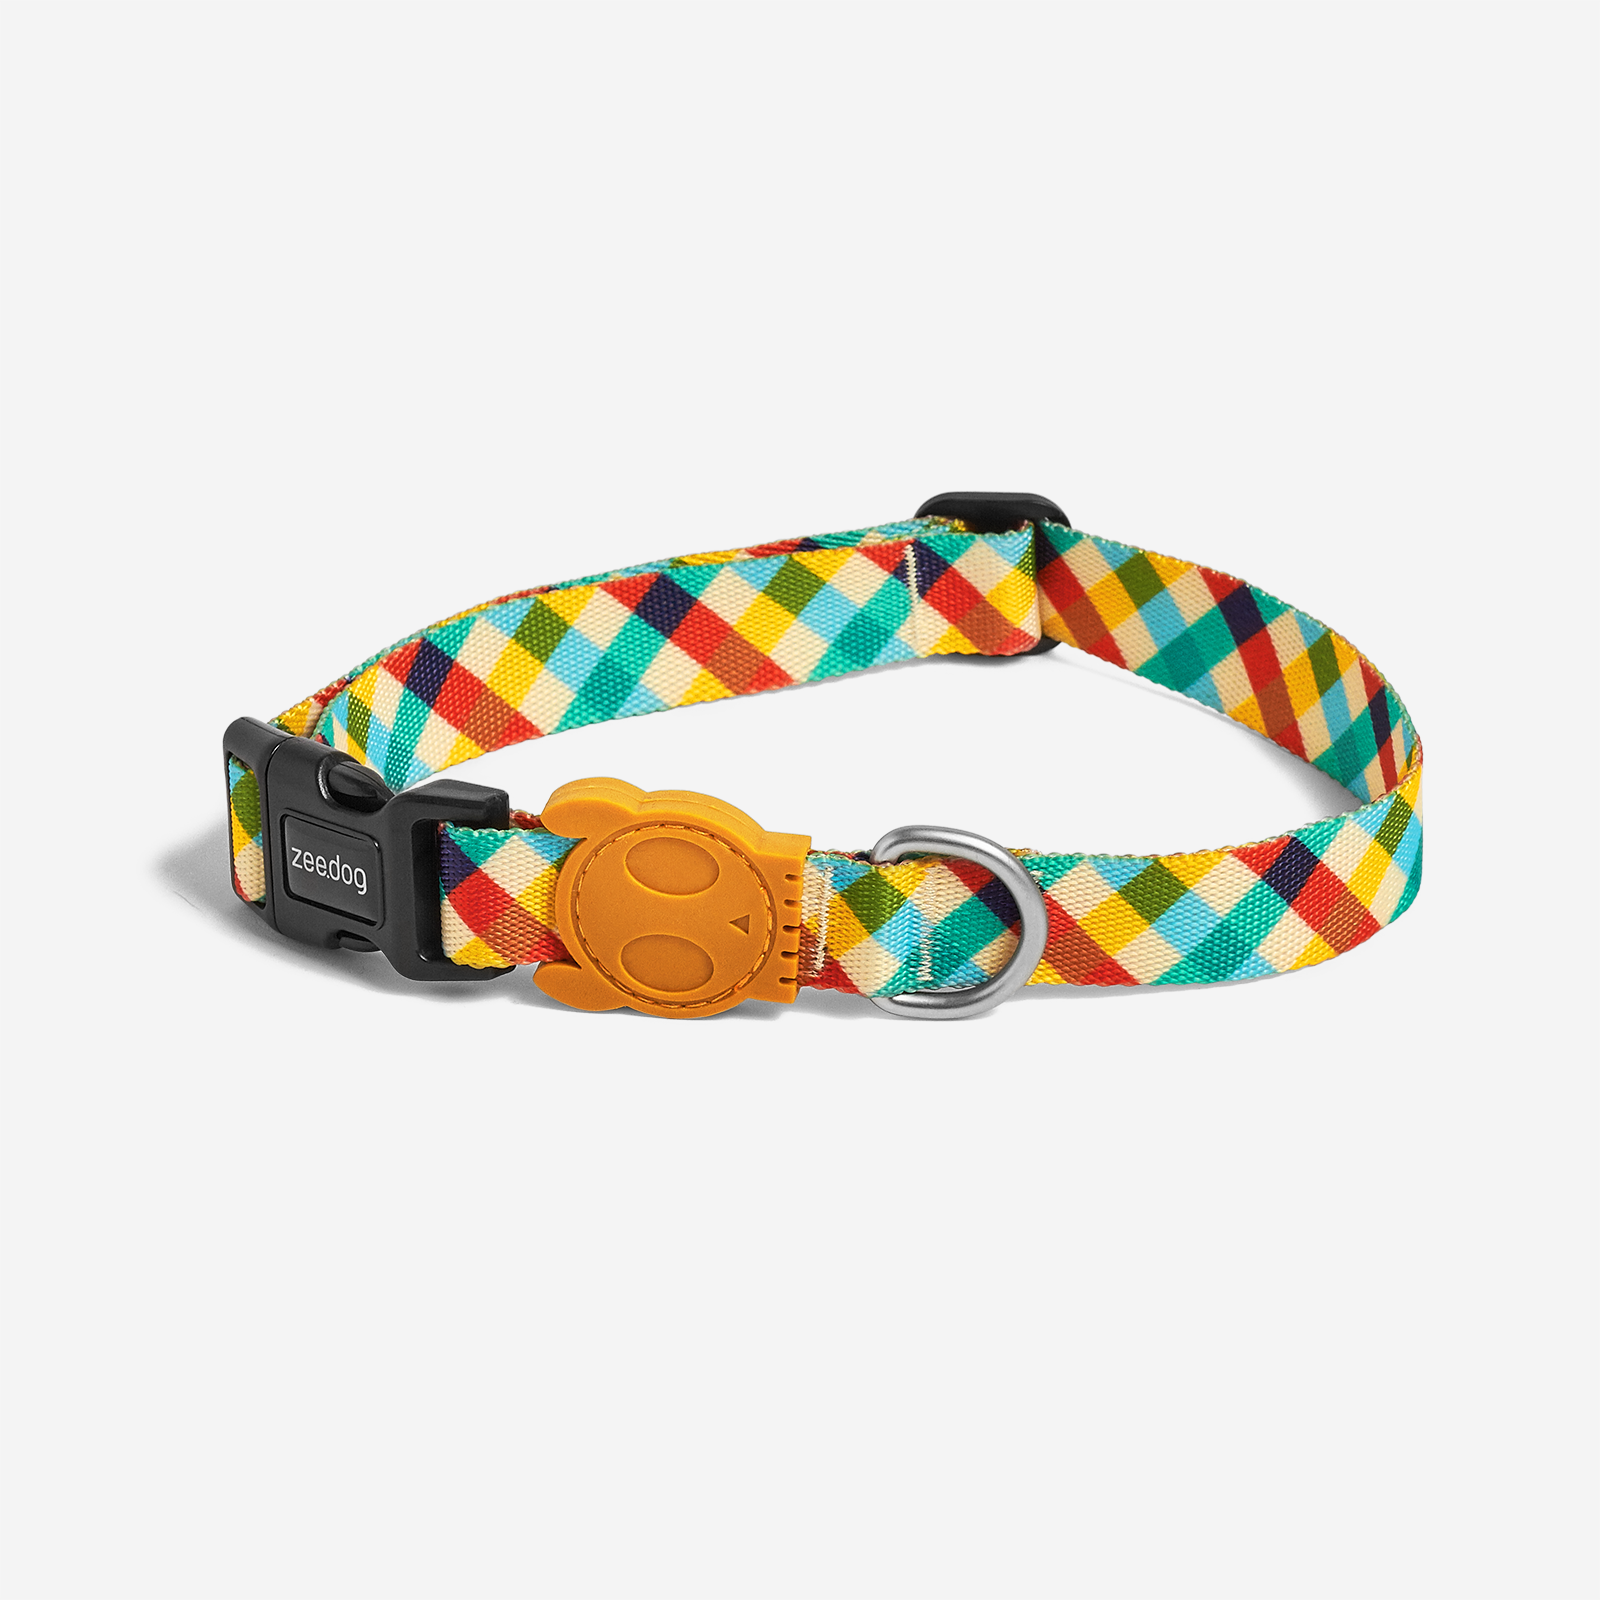 Dog Collar Phantom Zee Dog Dog Collar Dogs Collars